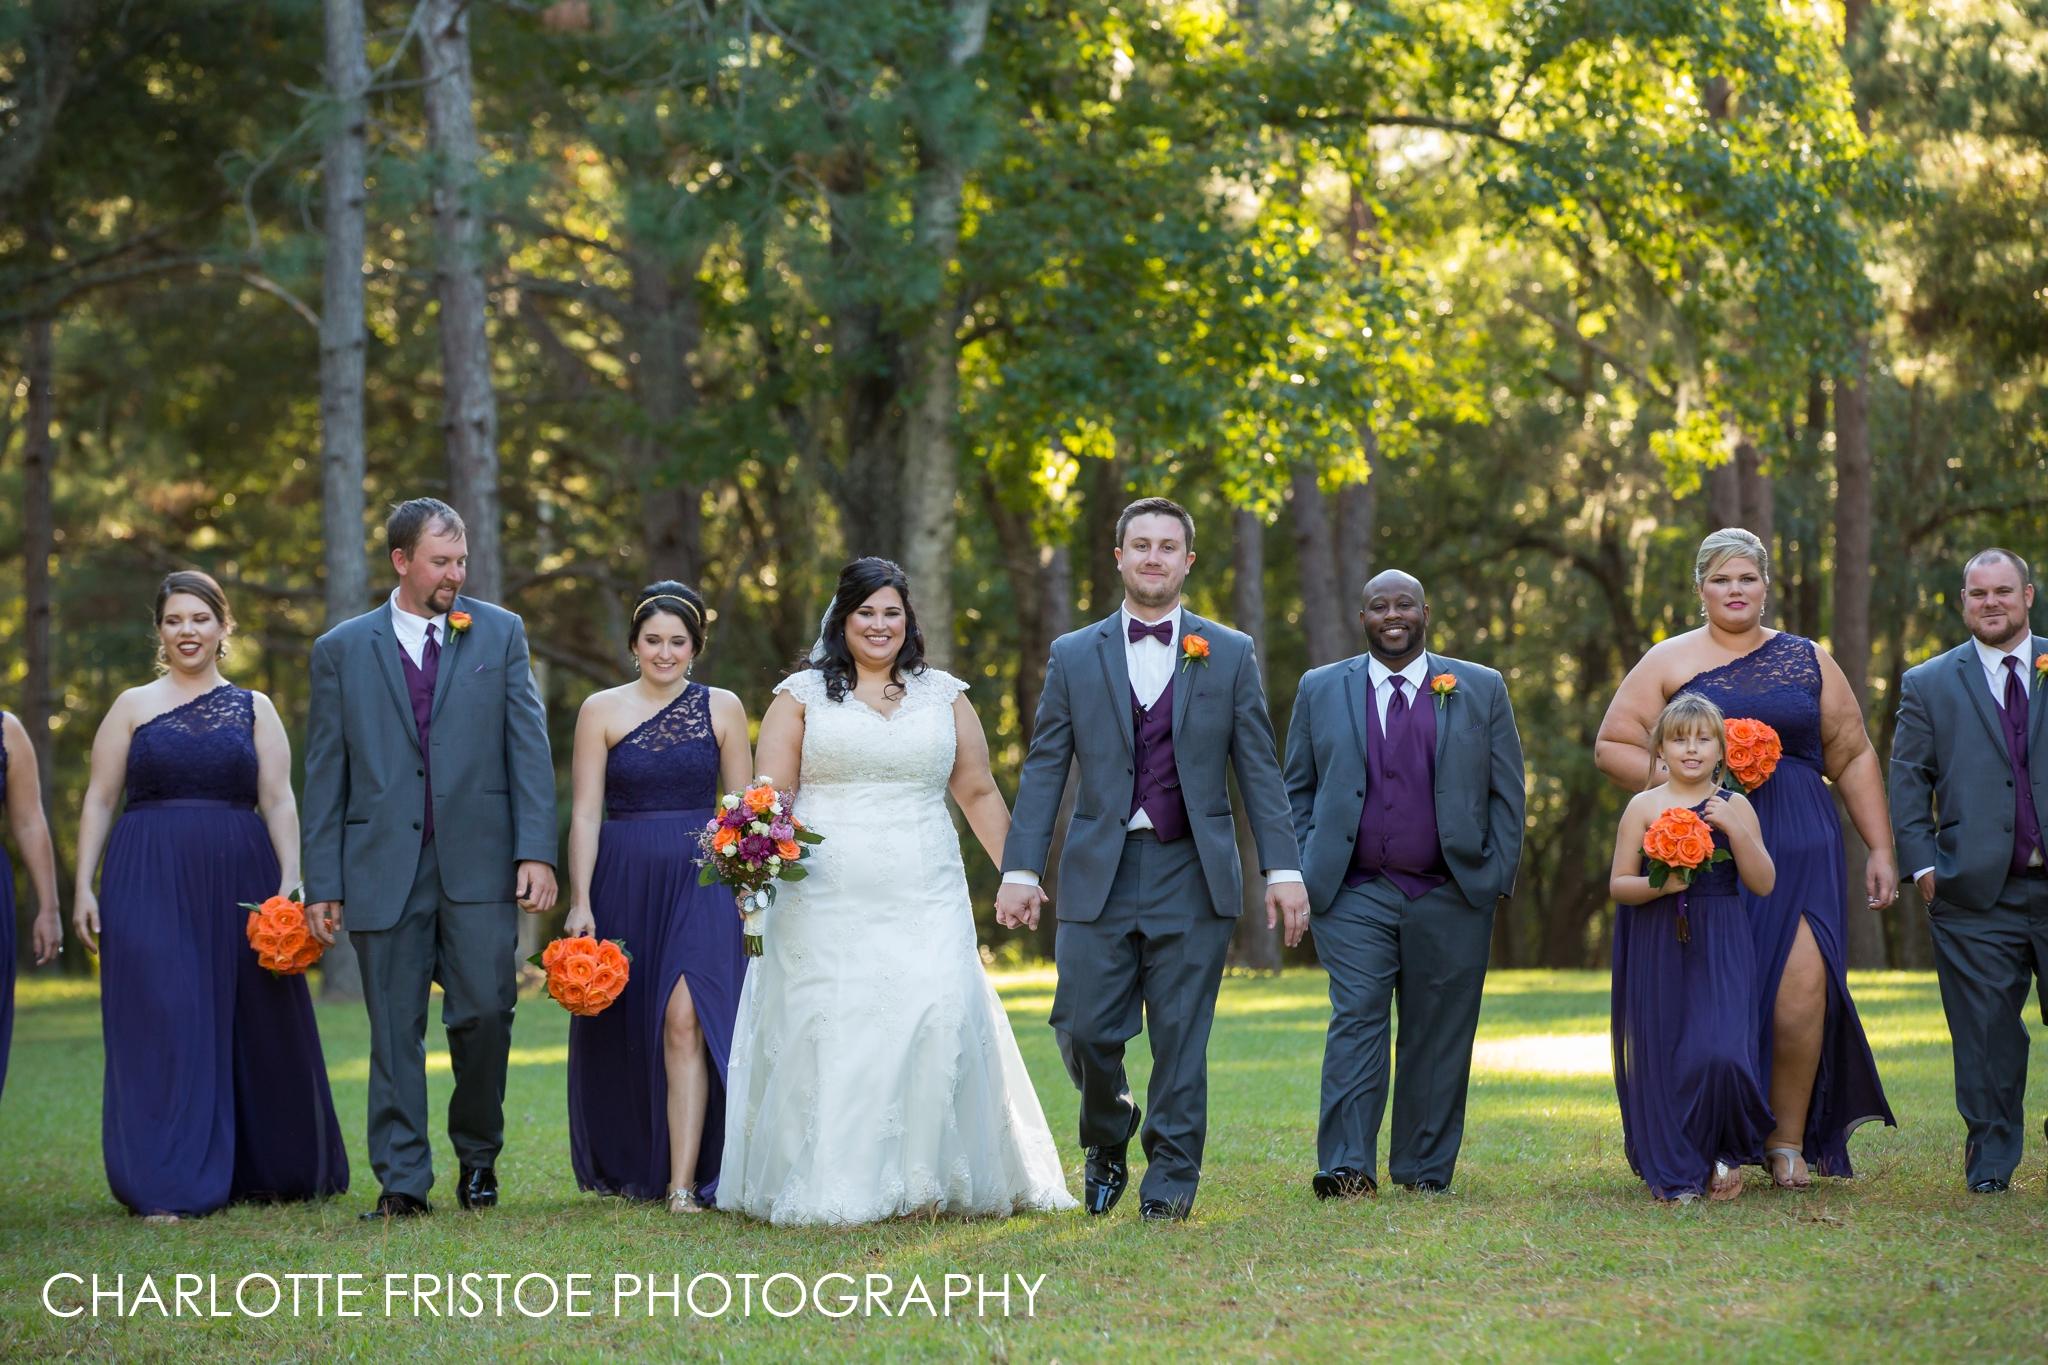 Lake Iamonia Wedding Charlotte Fristoe Photography-54.jpg